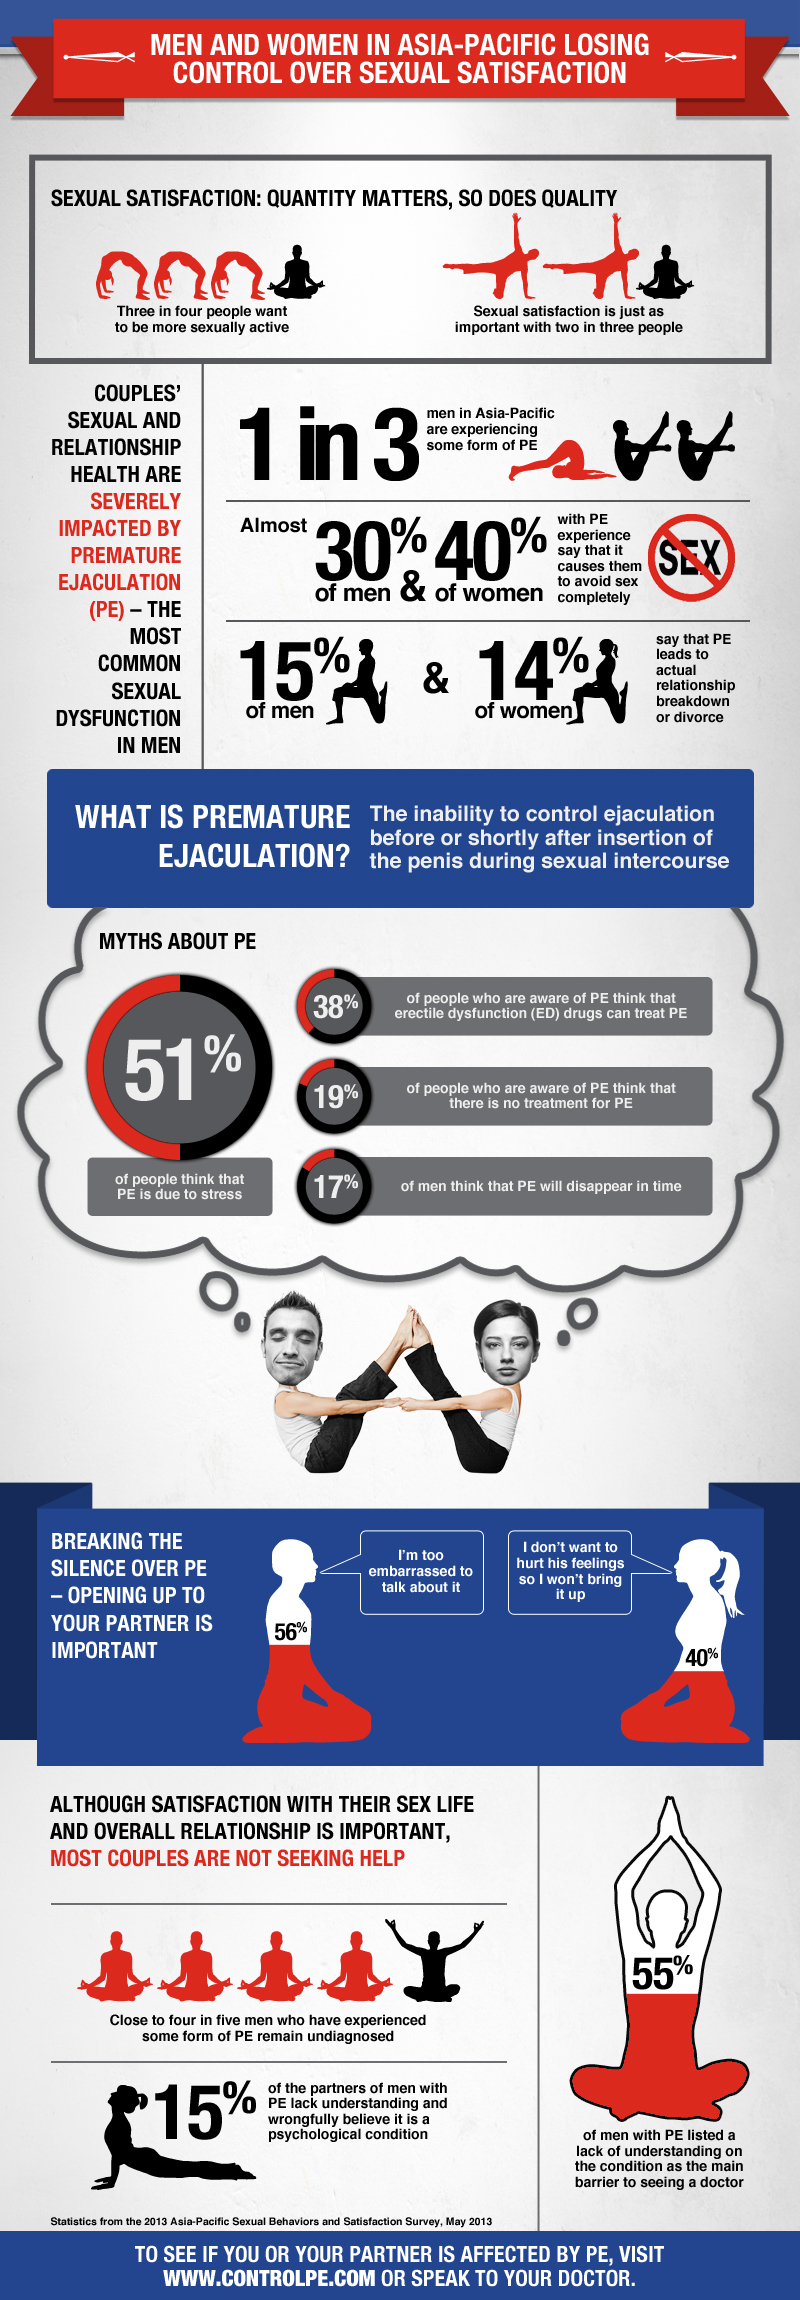 Premature Ejacoluation Infographic